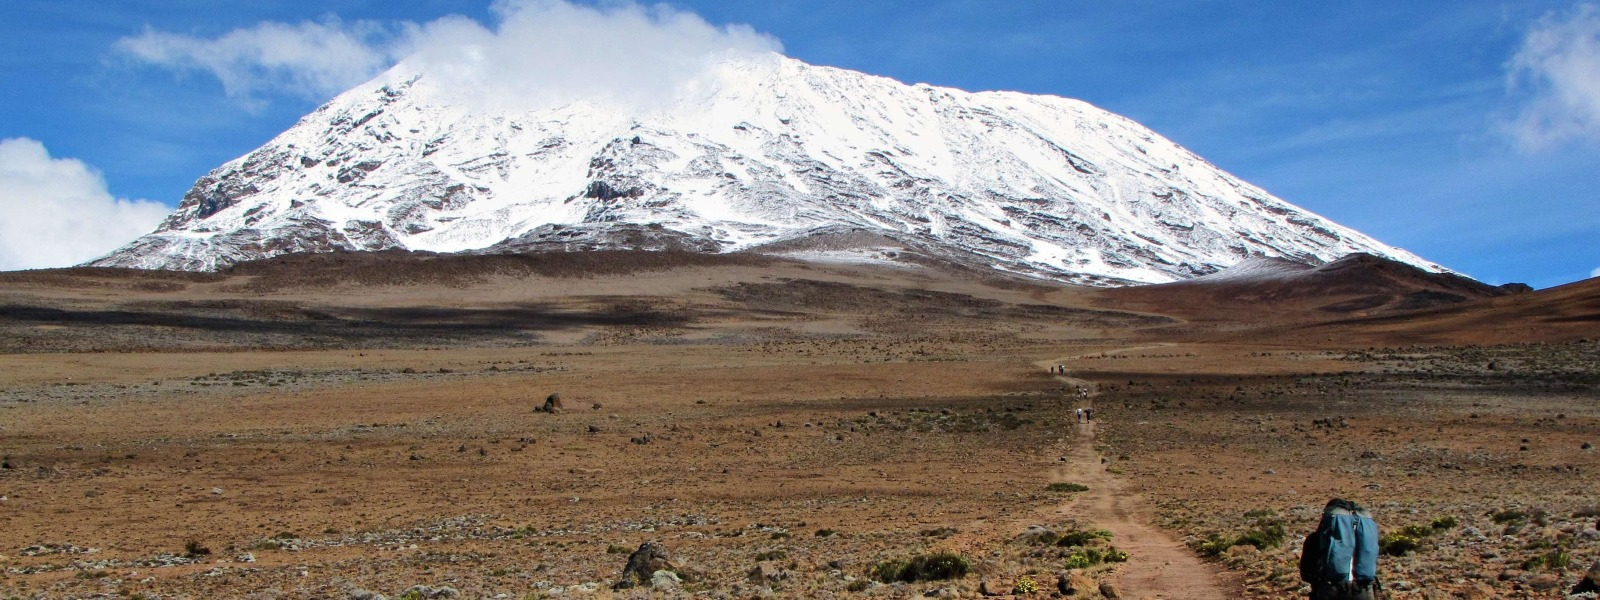 MountKilimanjaro-Tour-Guide